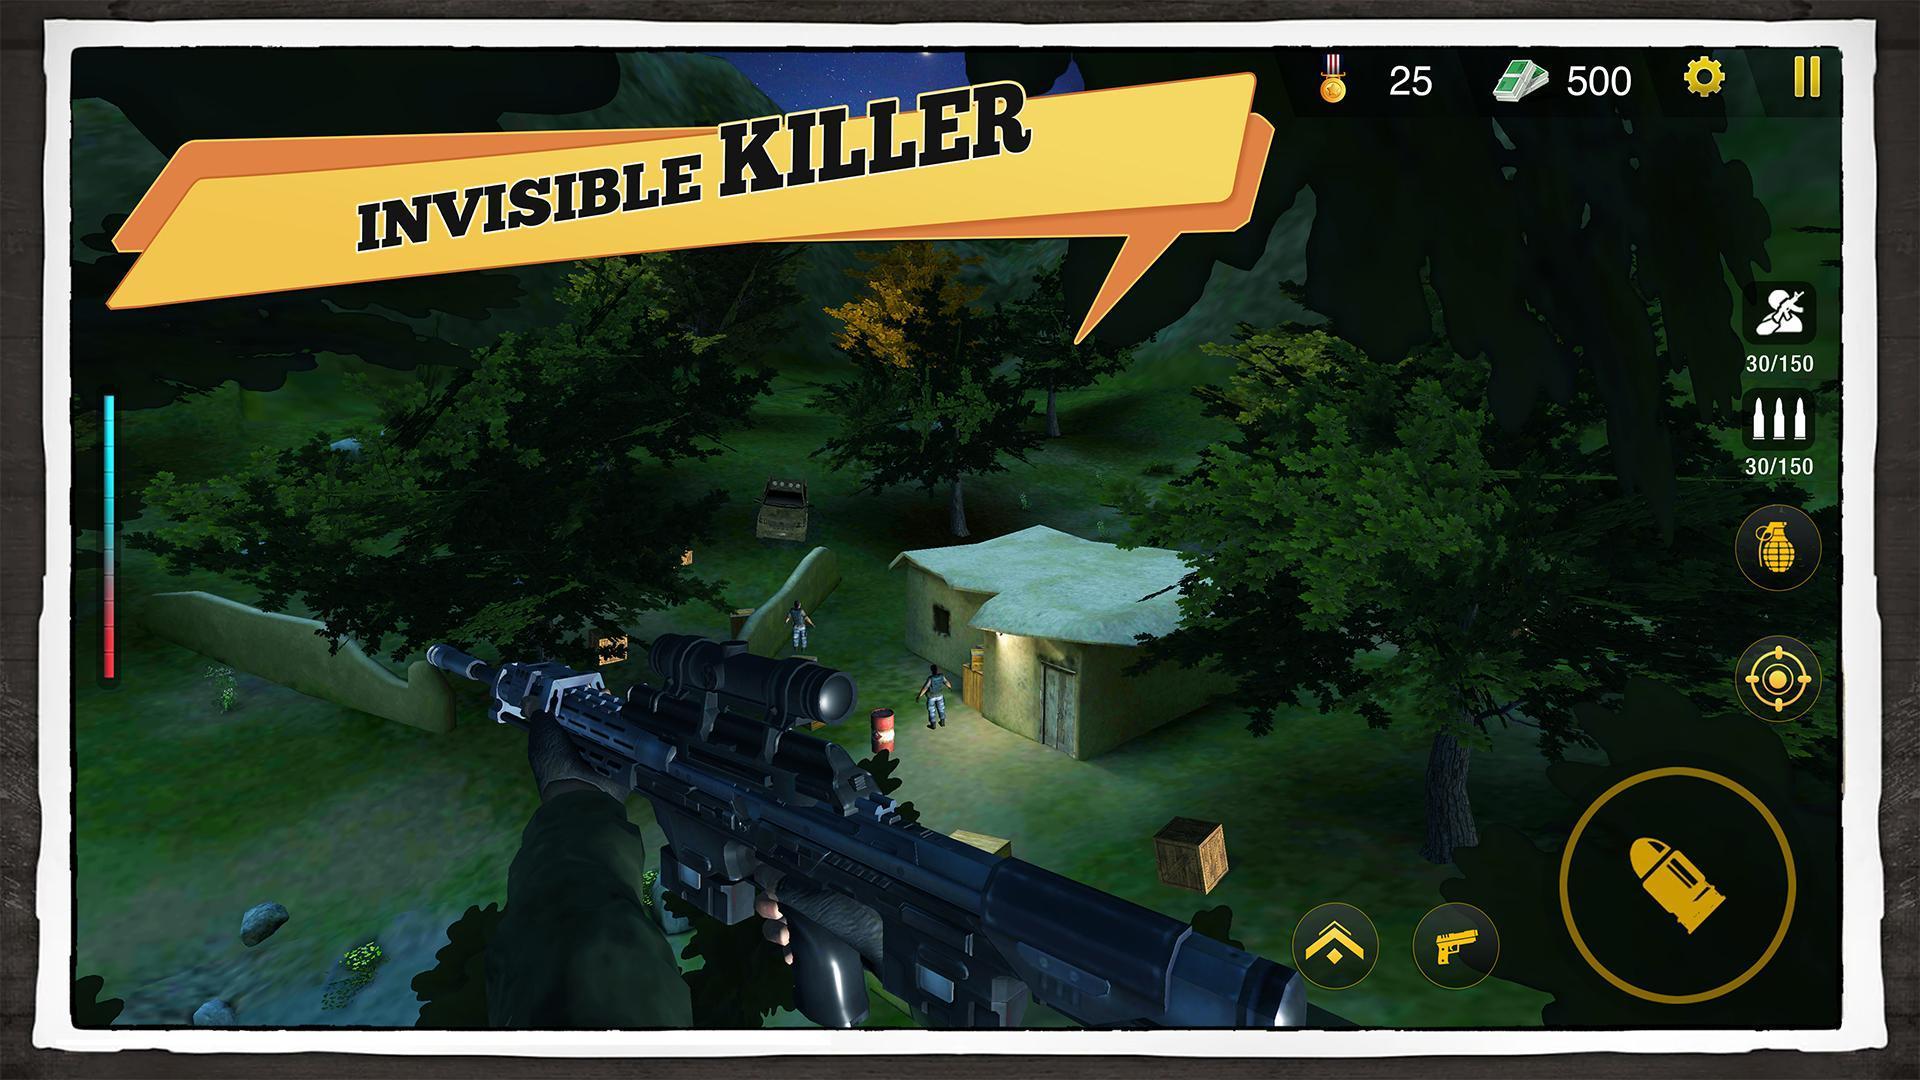 Yalghaar Delta IGI Commando Adventure Mobile Game 3.4 Screenshot 8